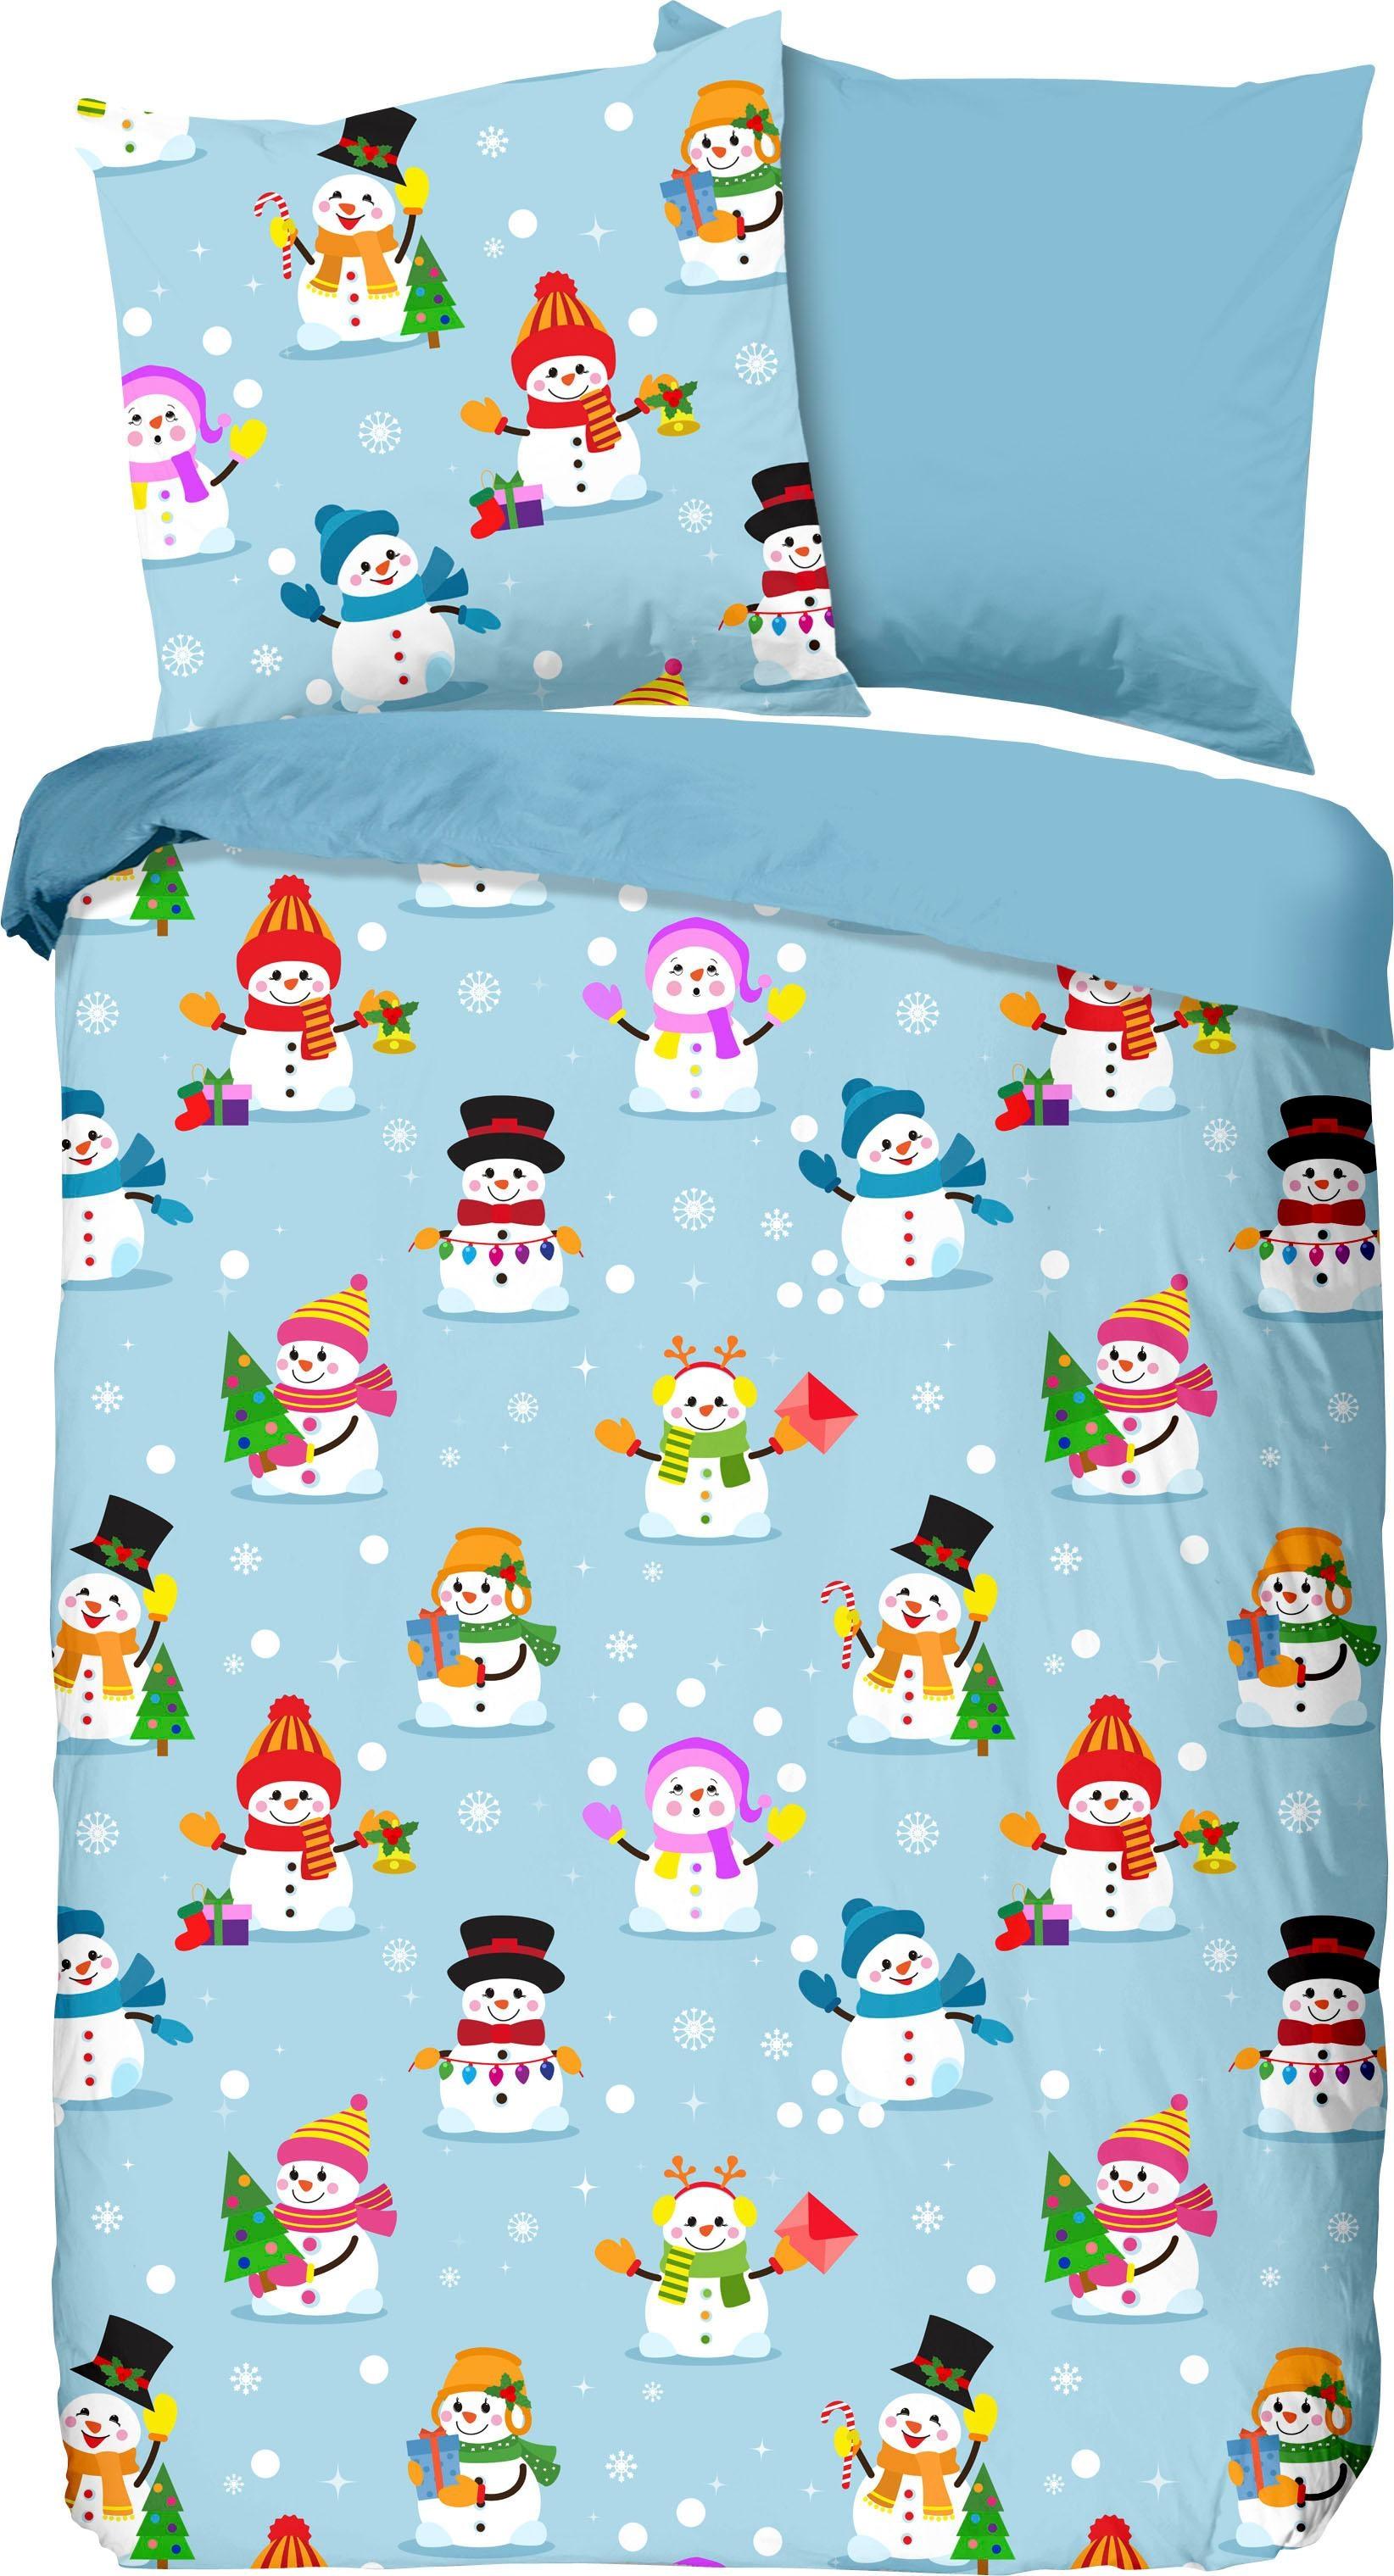 Kinderbettwäsche Snowmen good morning